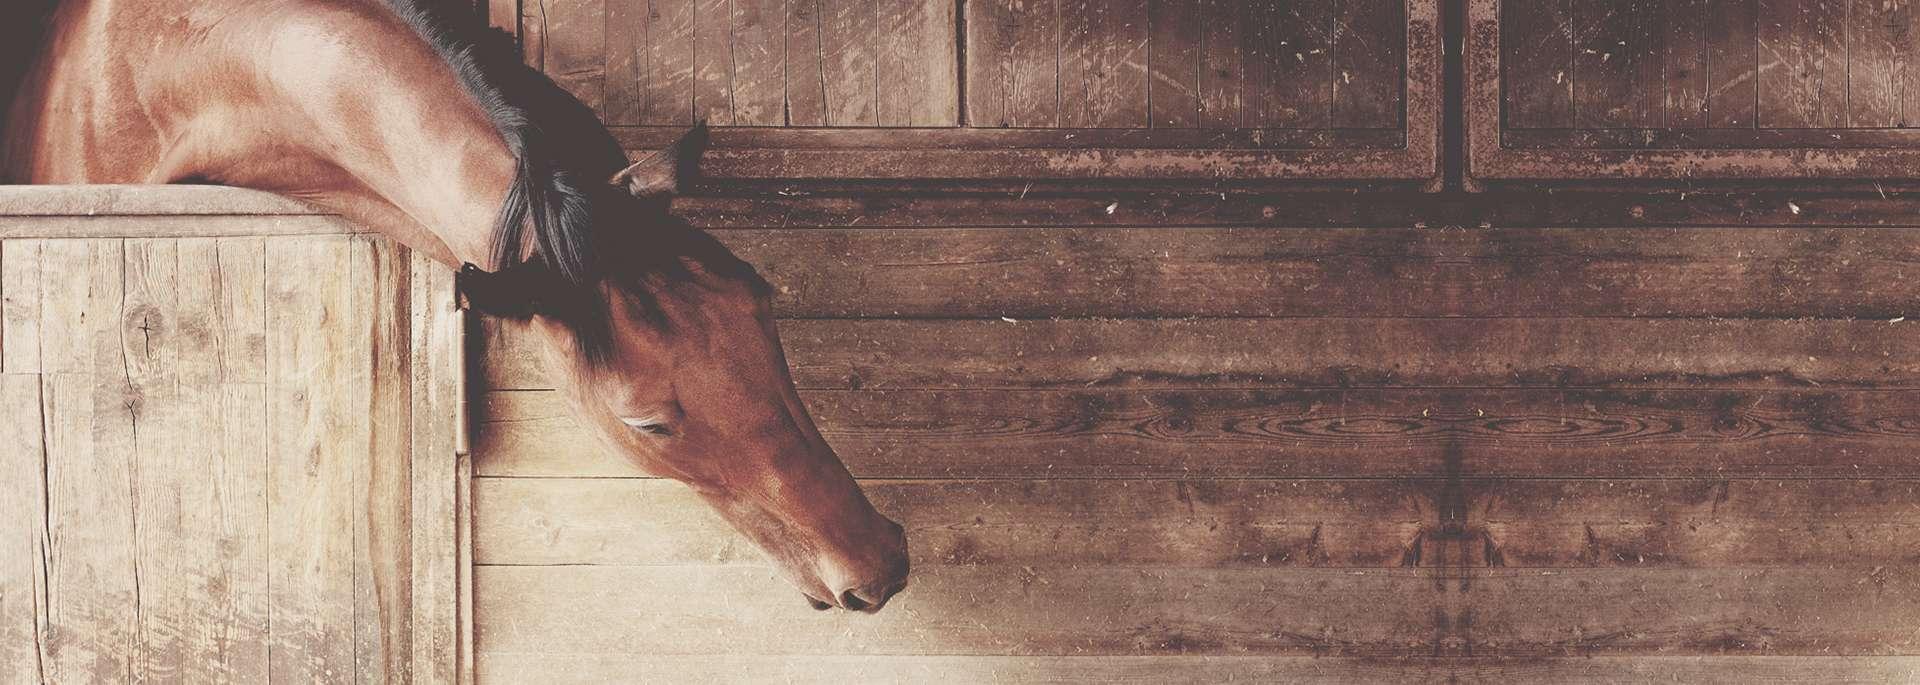 Saddle fitting - ajustement de selle